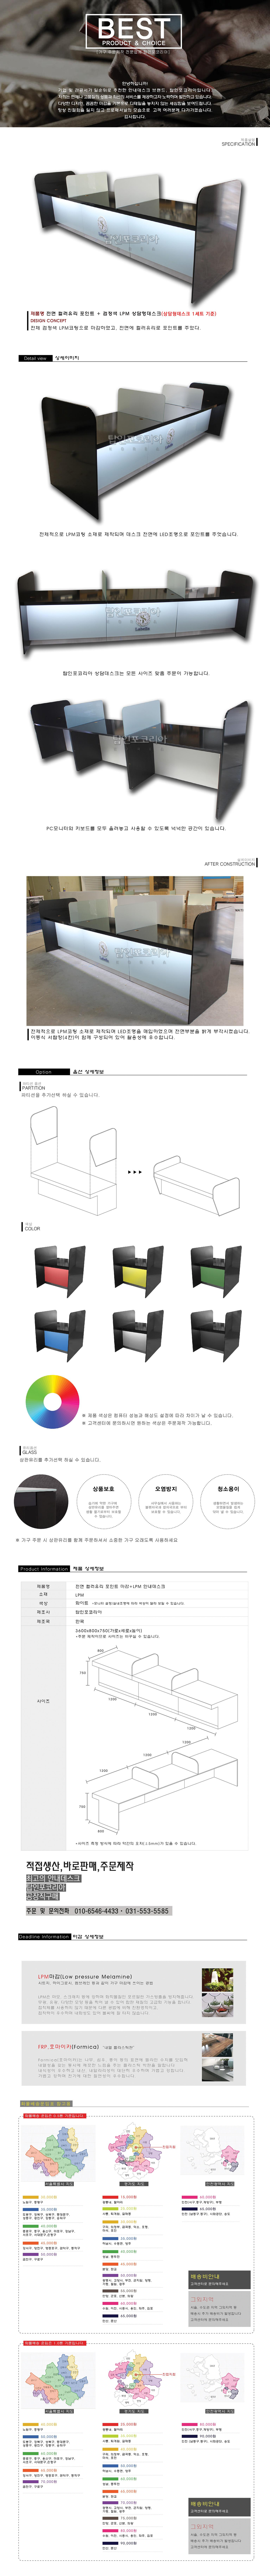 No17-전면-컬러유리-포인트-+-백색-LPM-상담형데스크-01.jpg